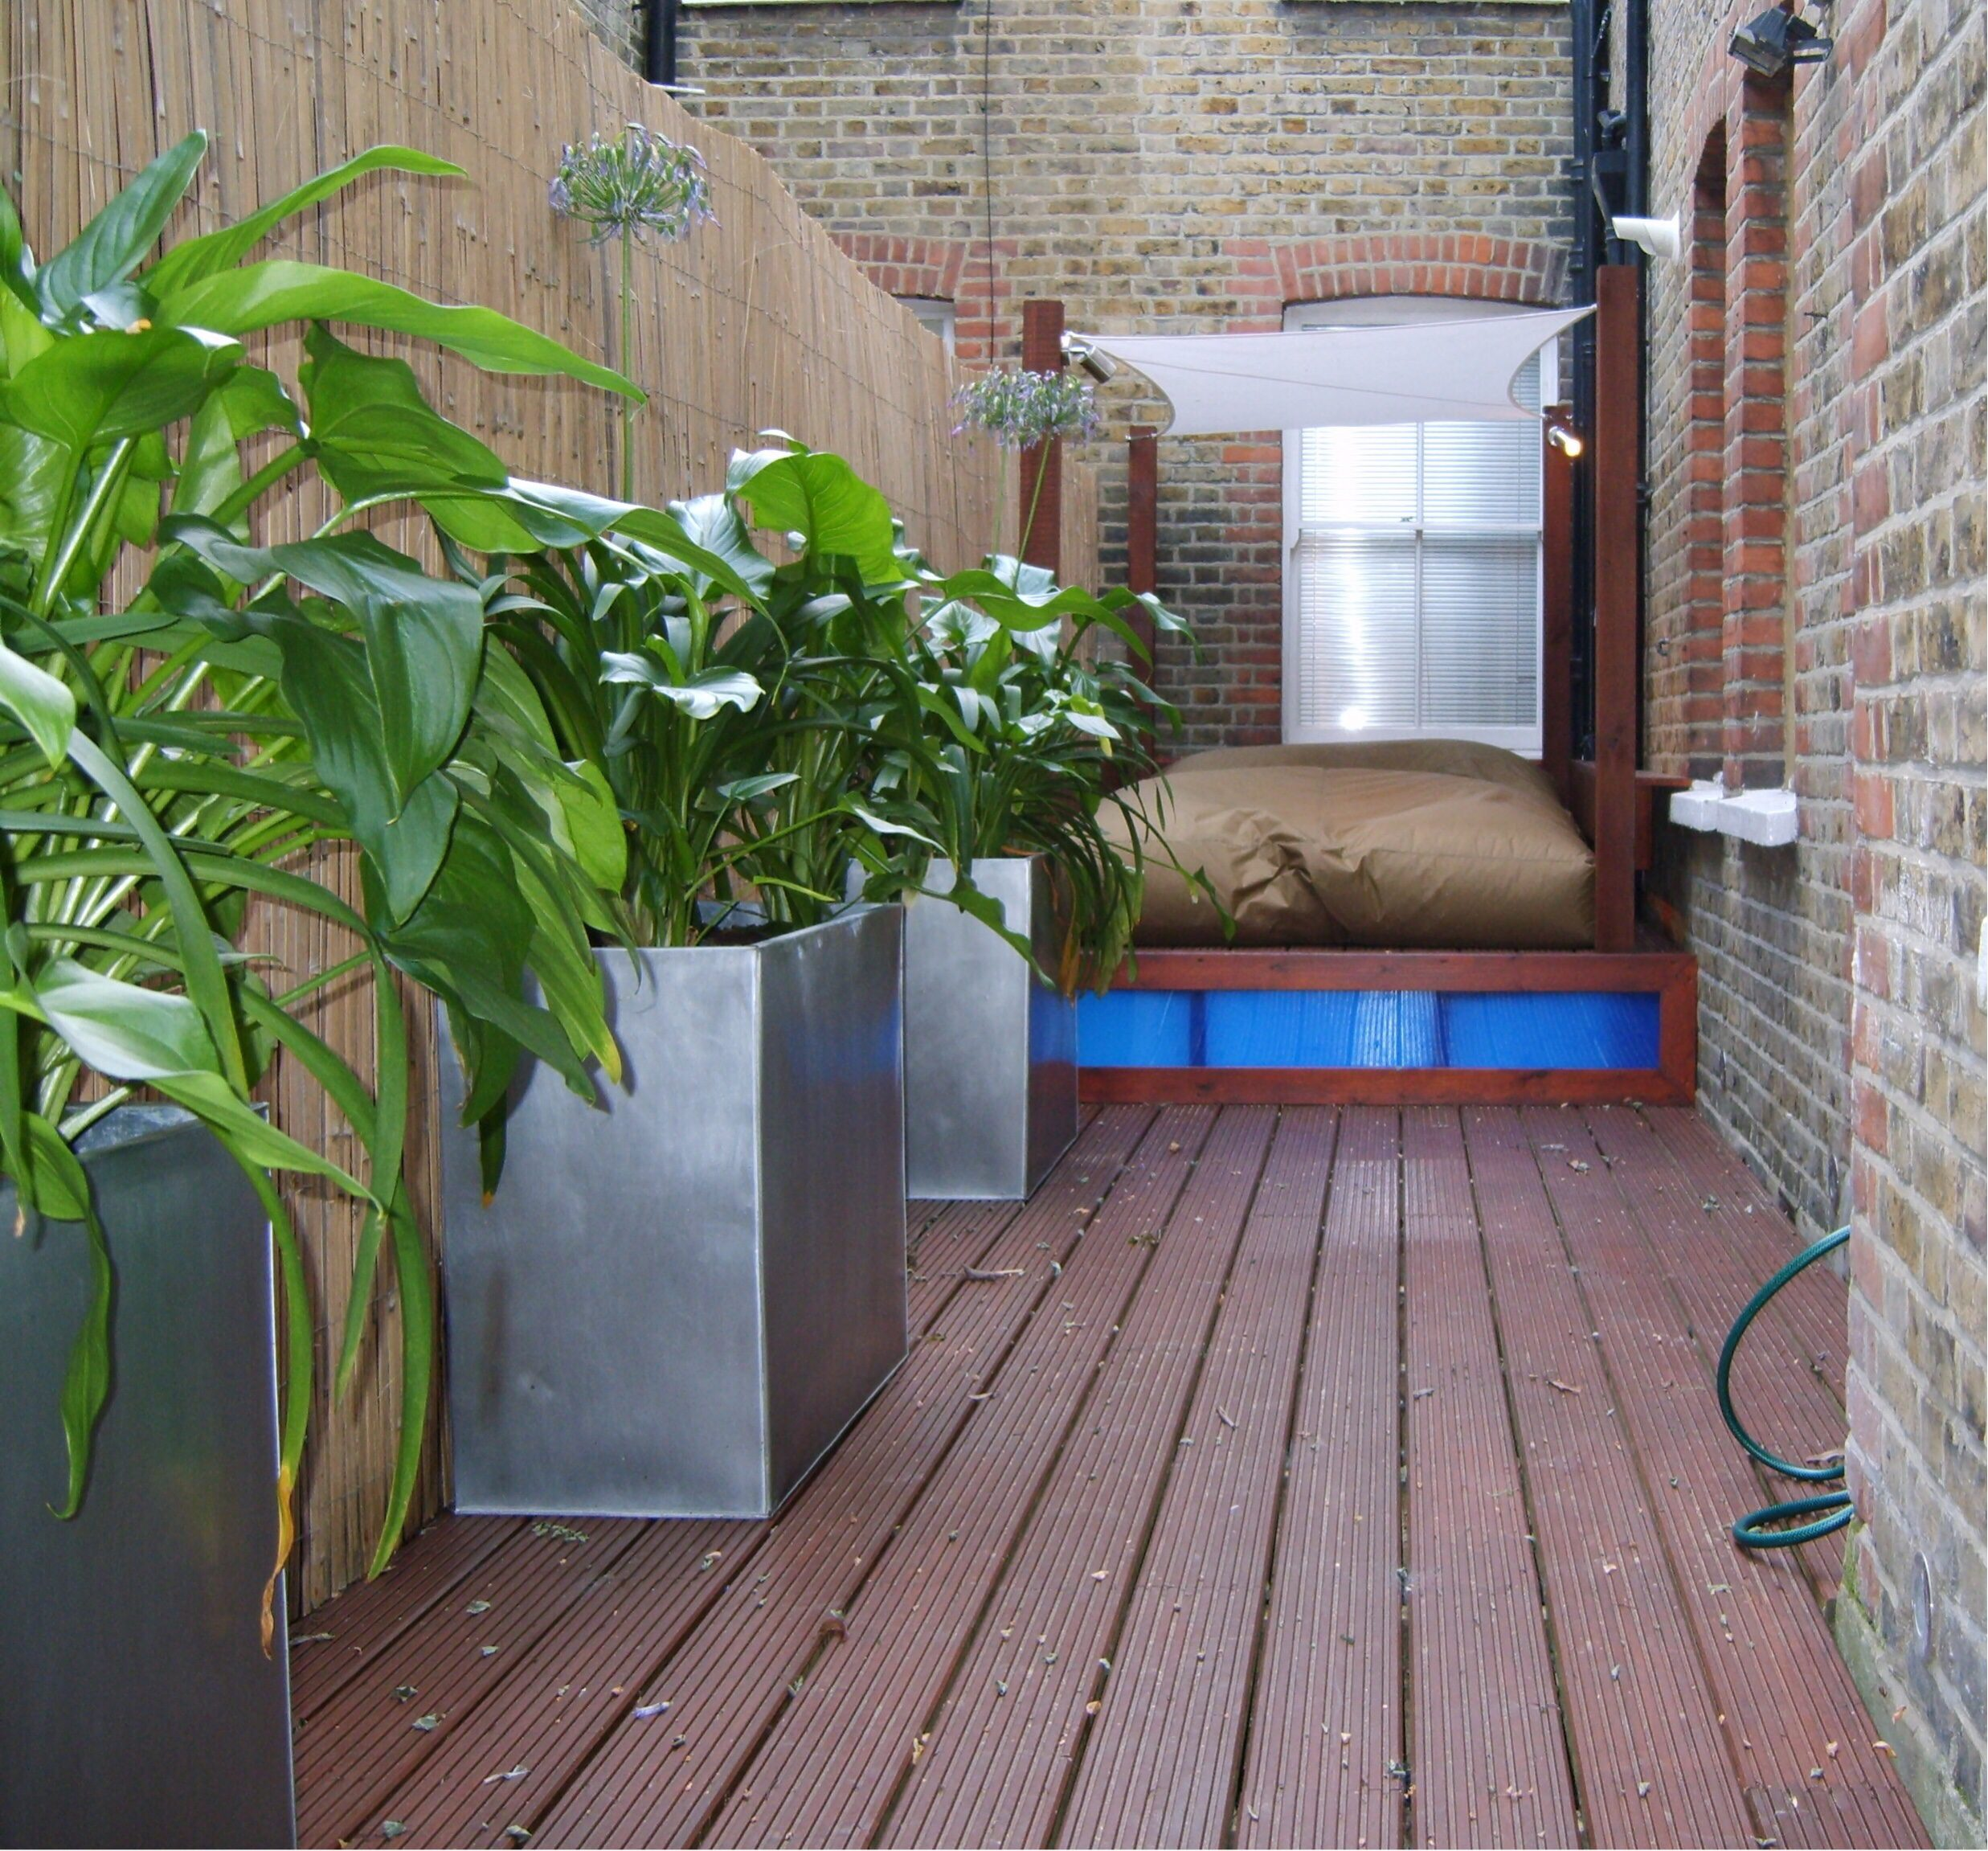 Shade sails are popular in private garden design